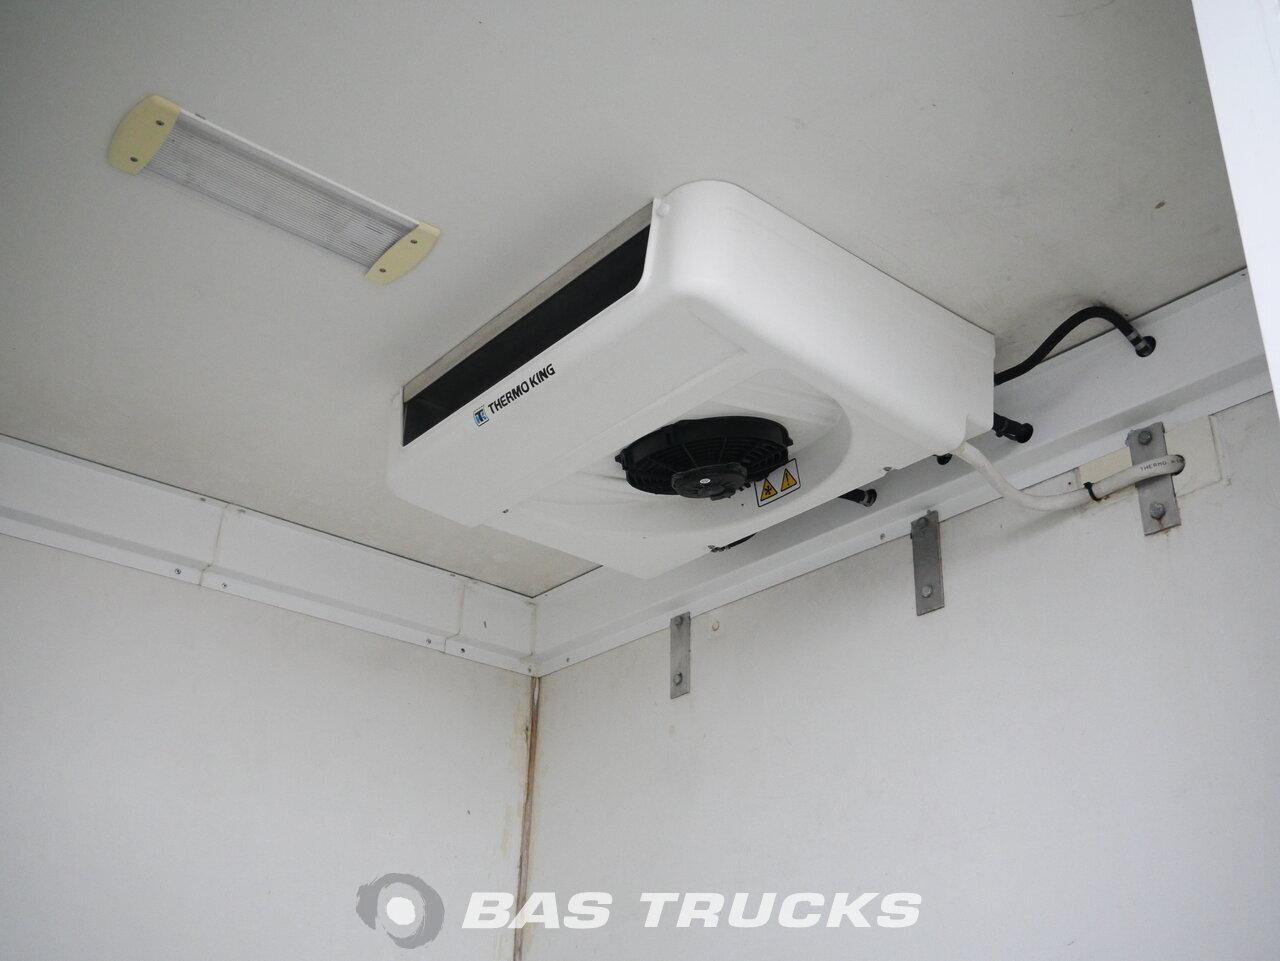 Fiat Garage Rotterdam : Fiat ducato leichte nutzfahrzeuge euro 5 u20ac29900 bas trucks